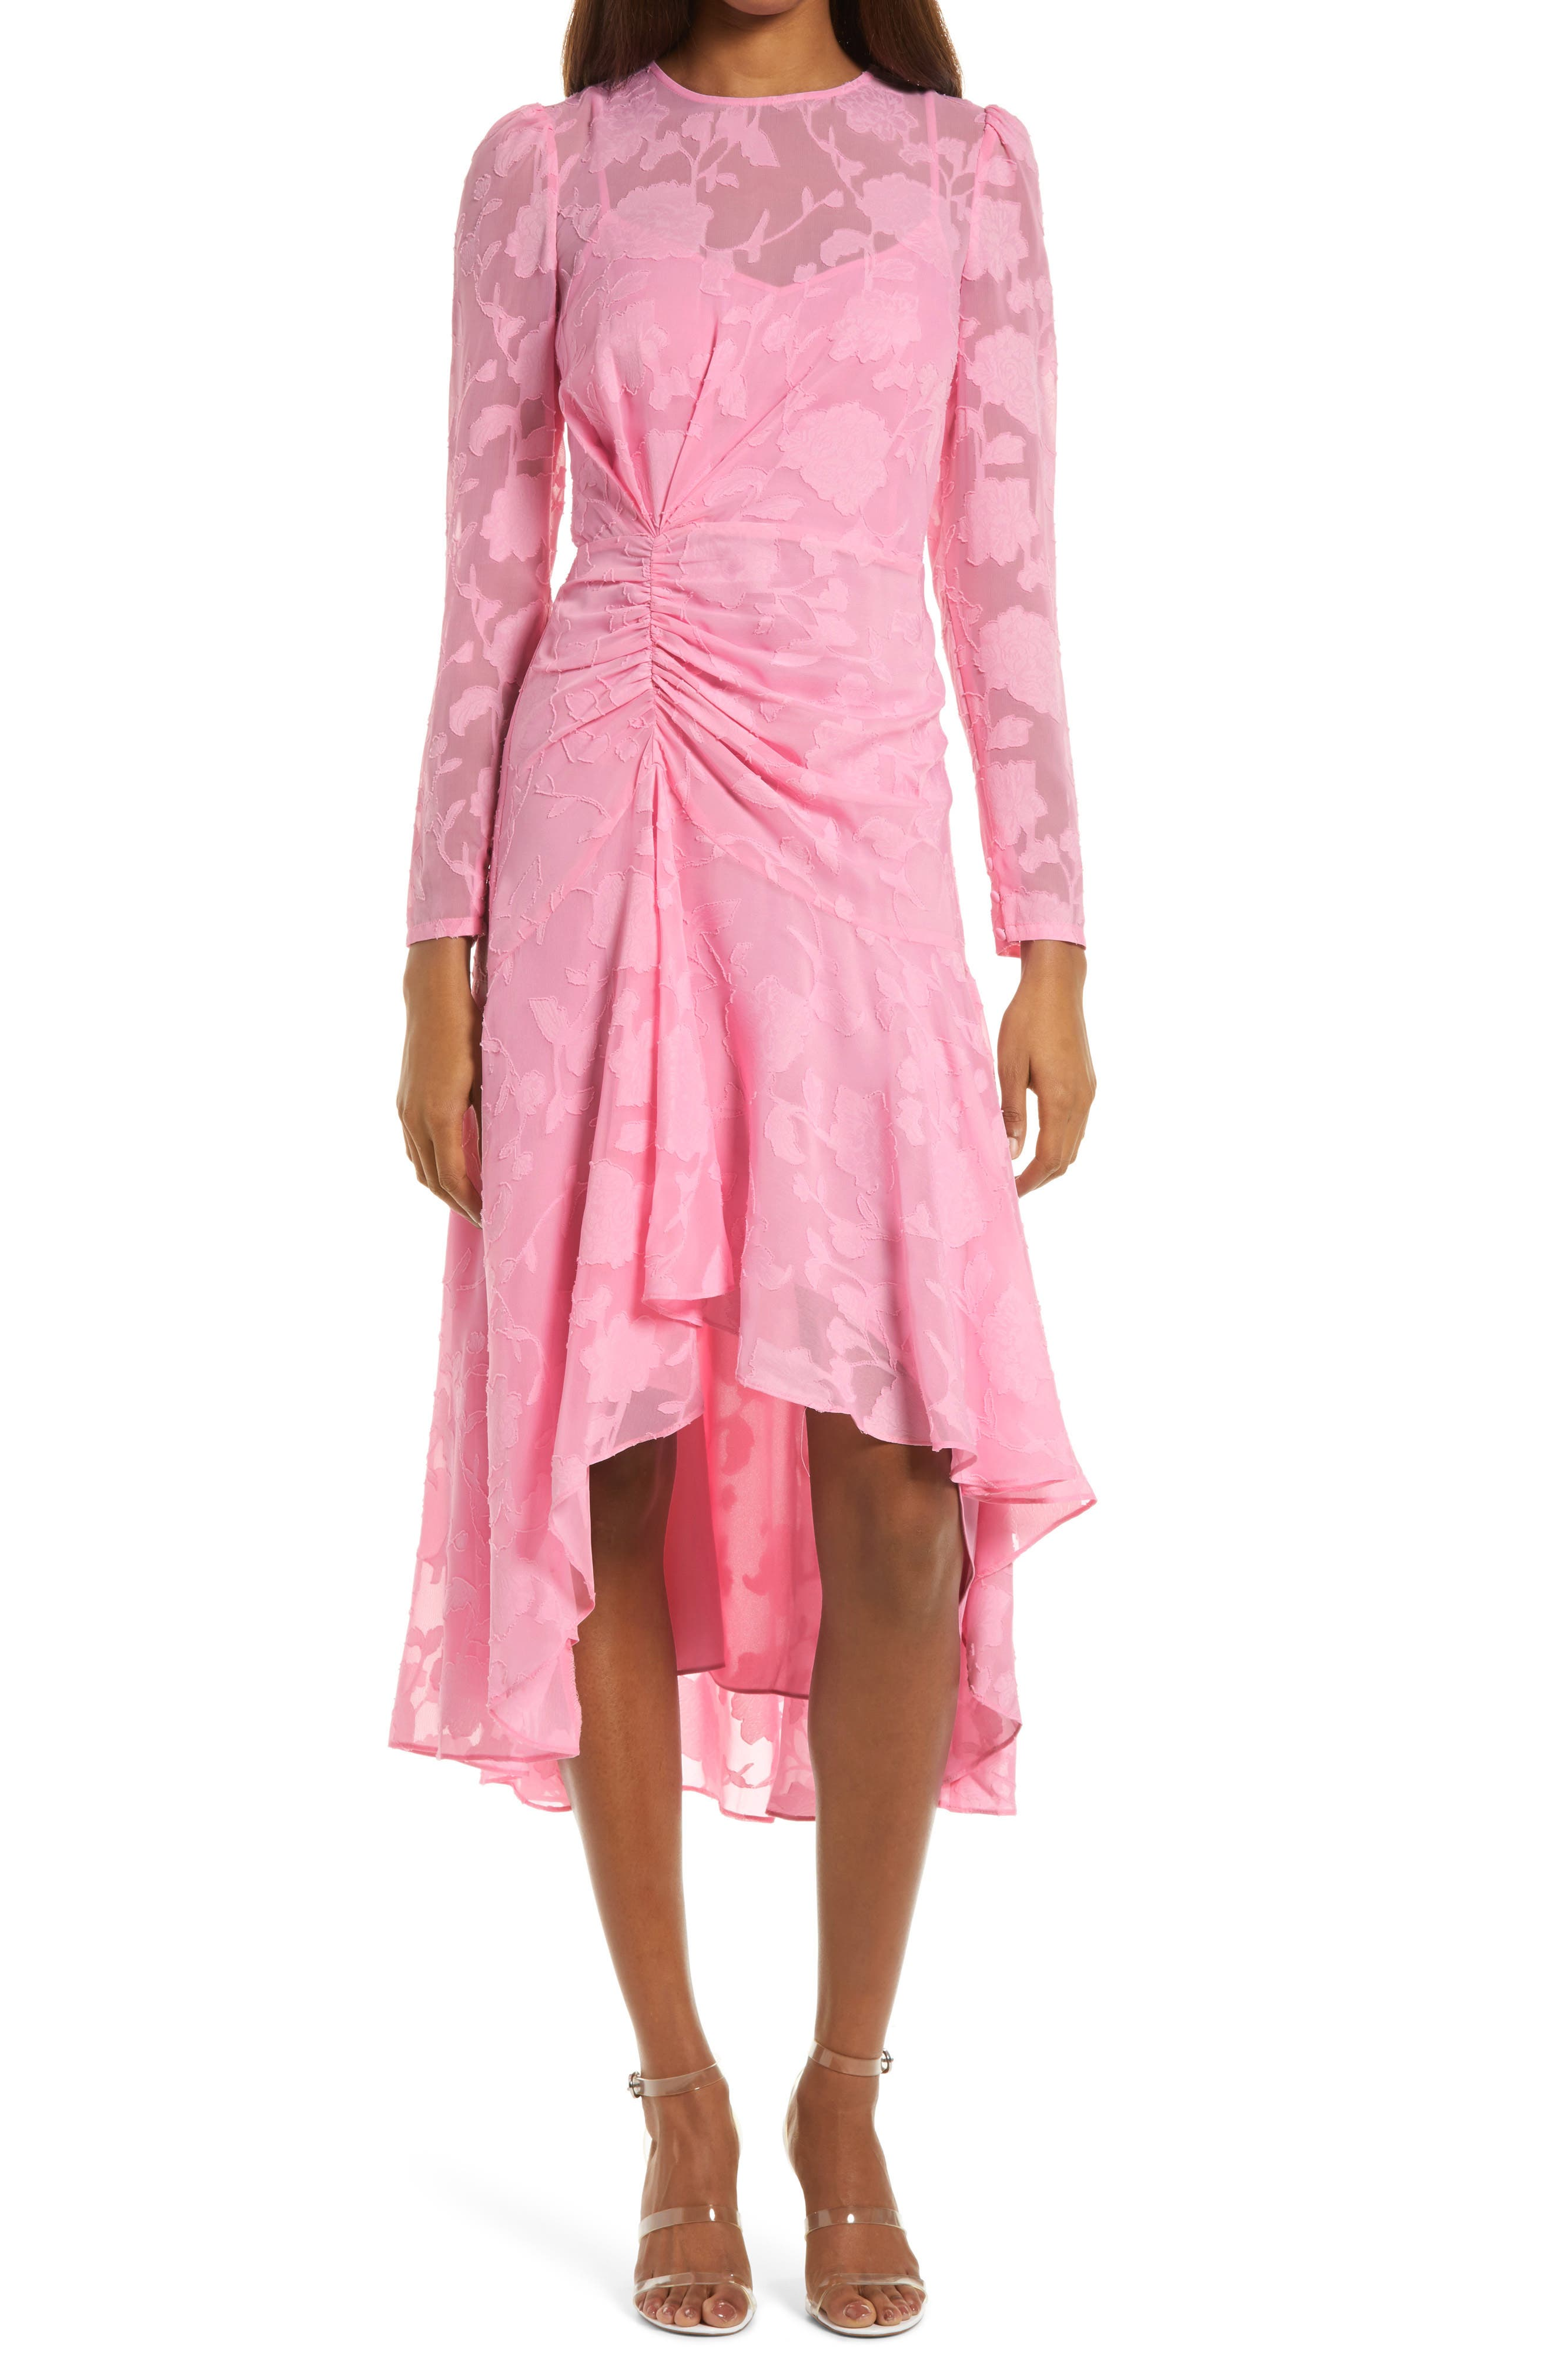 Floral Jacquard Long Sleeve High/Low Dress